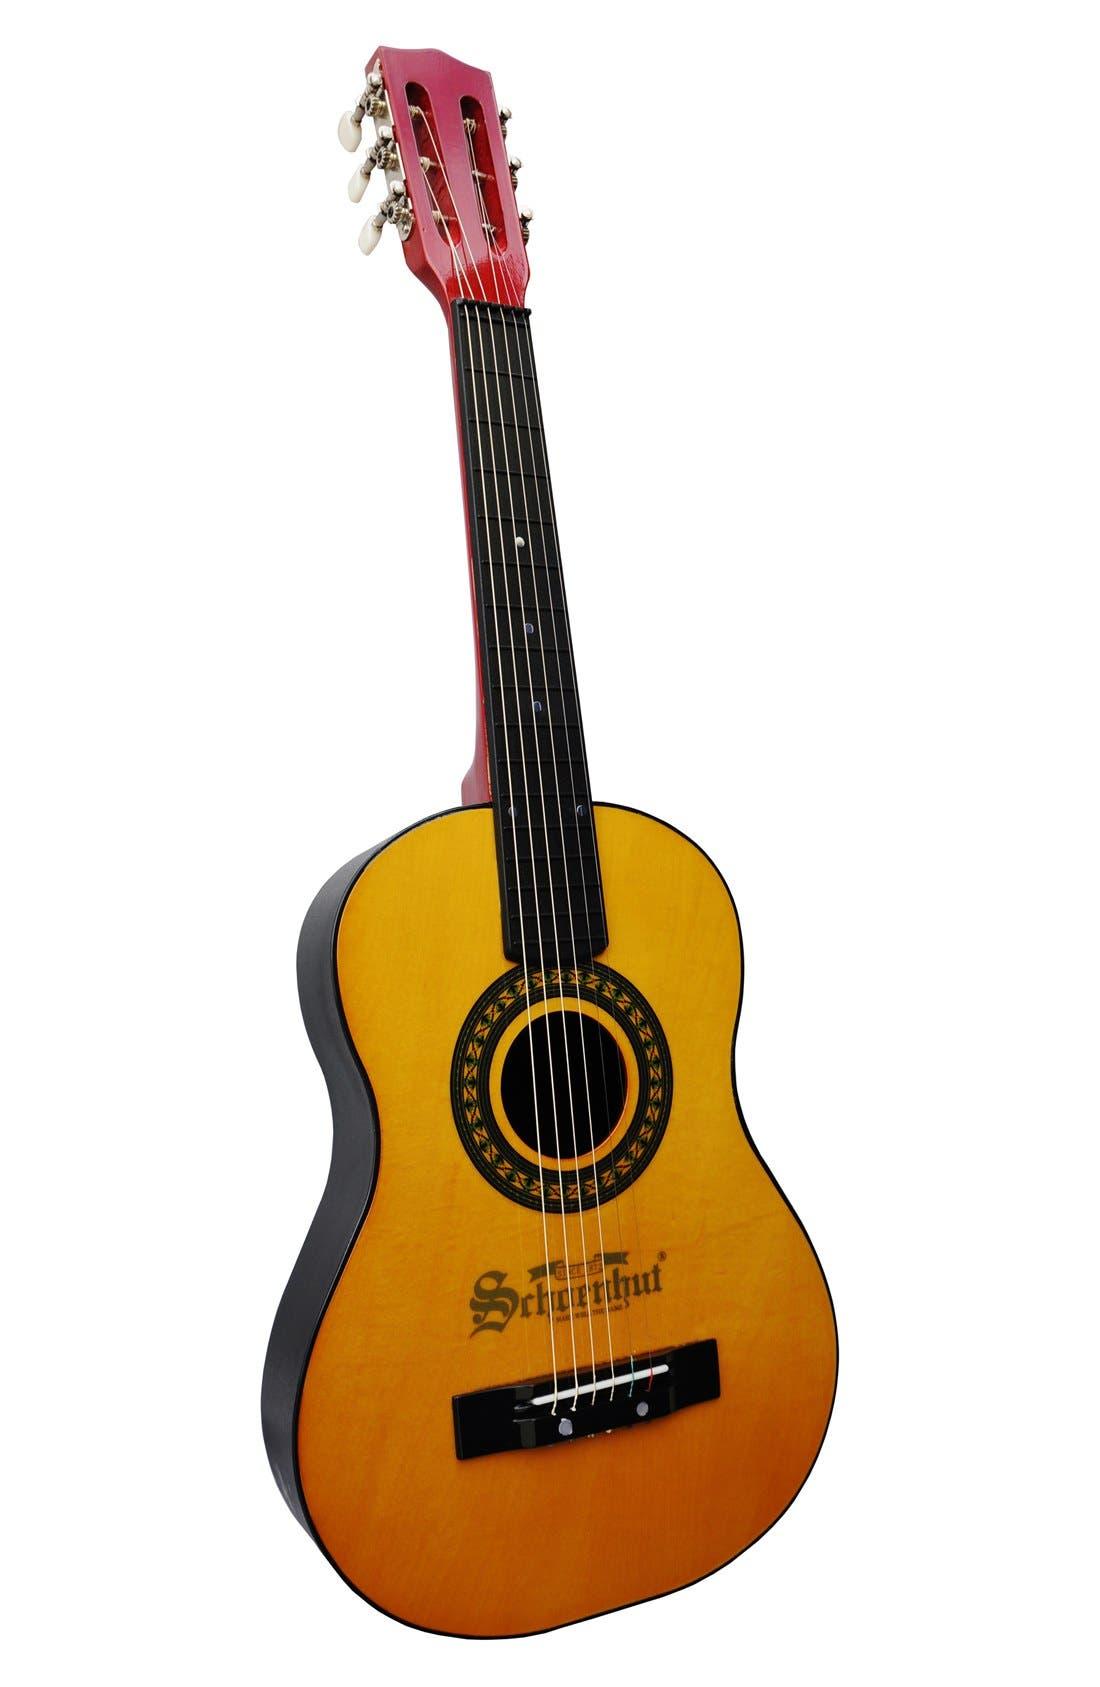 Main Image - Schoenhut Six-String Acoustic Guitar